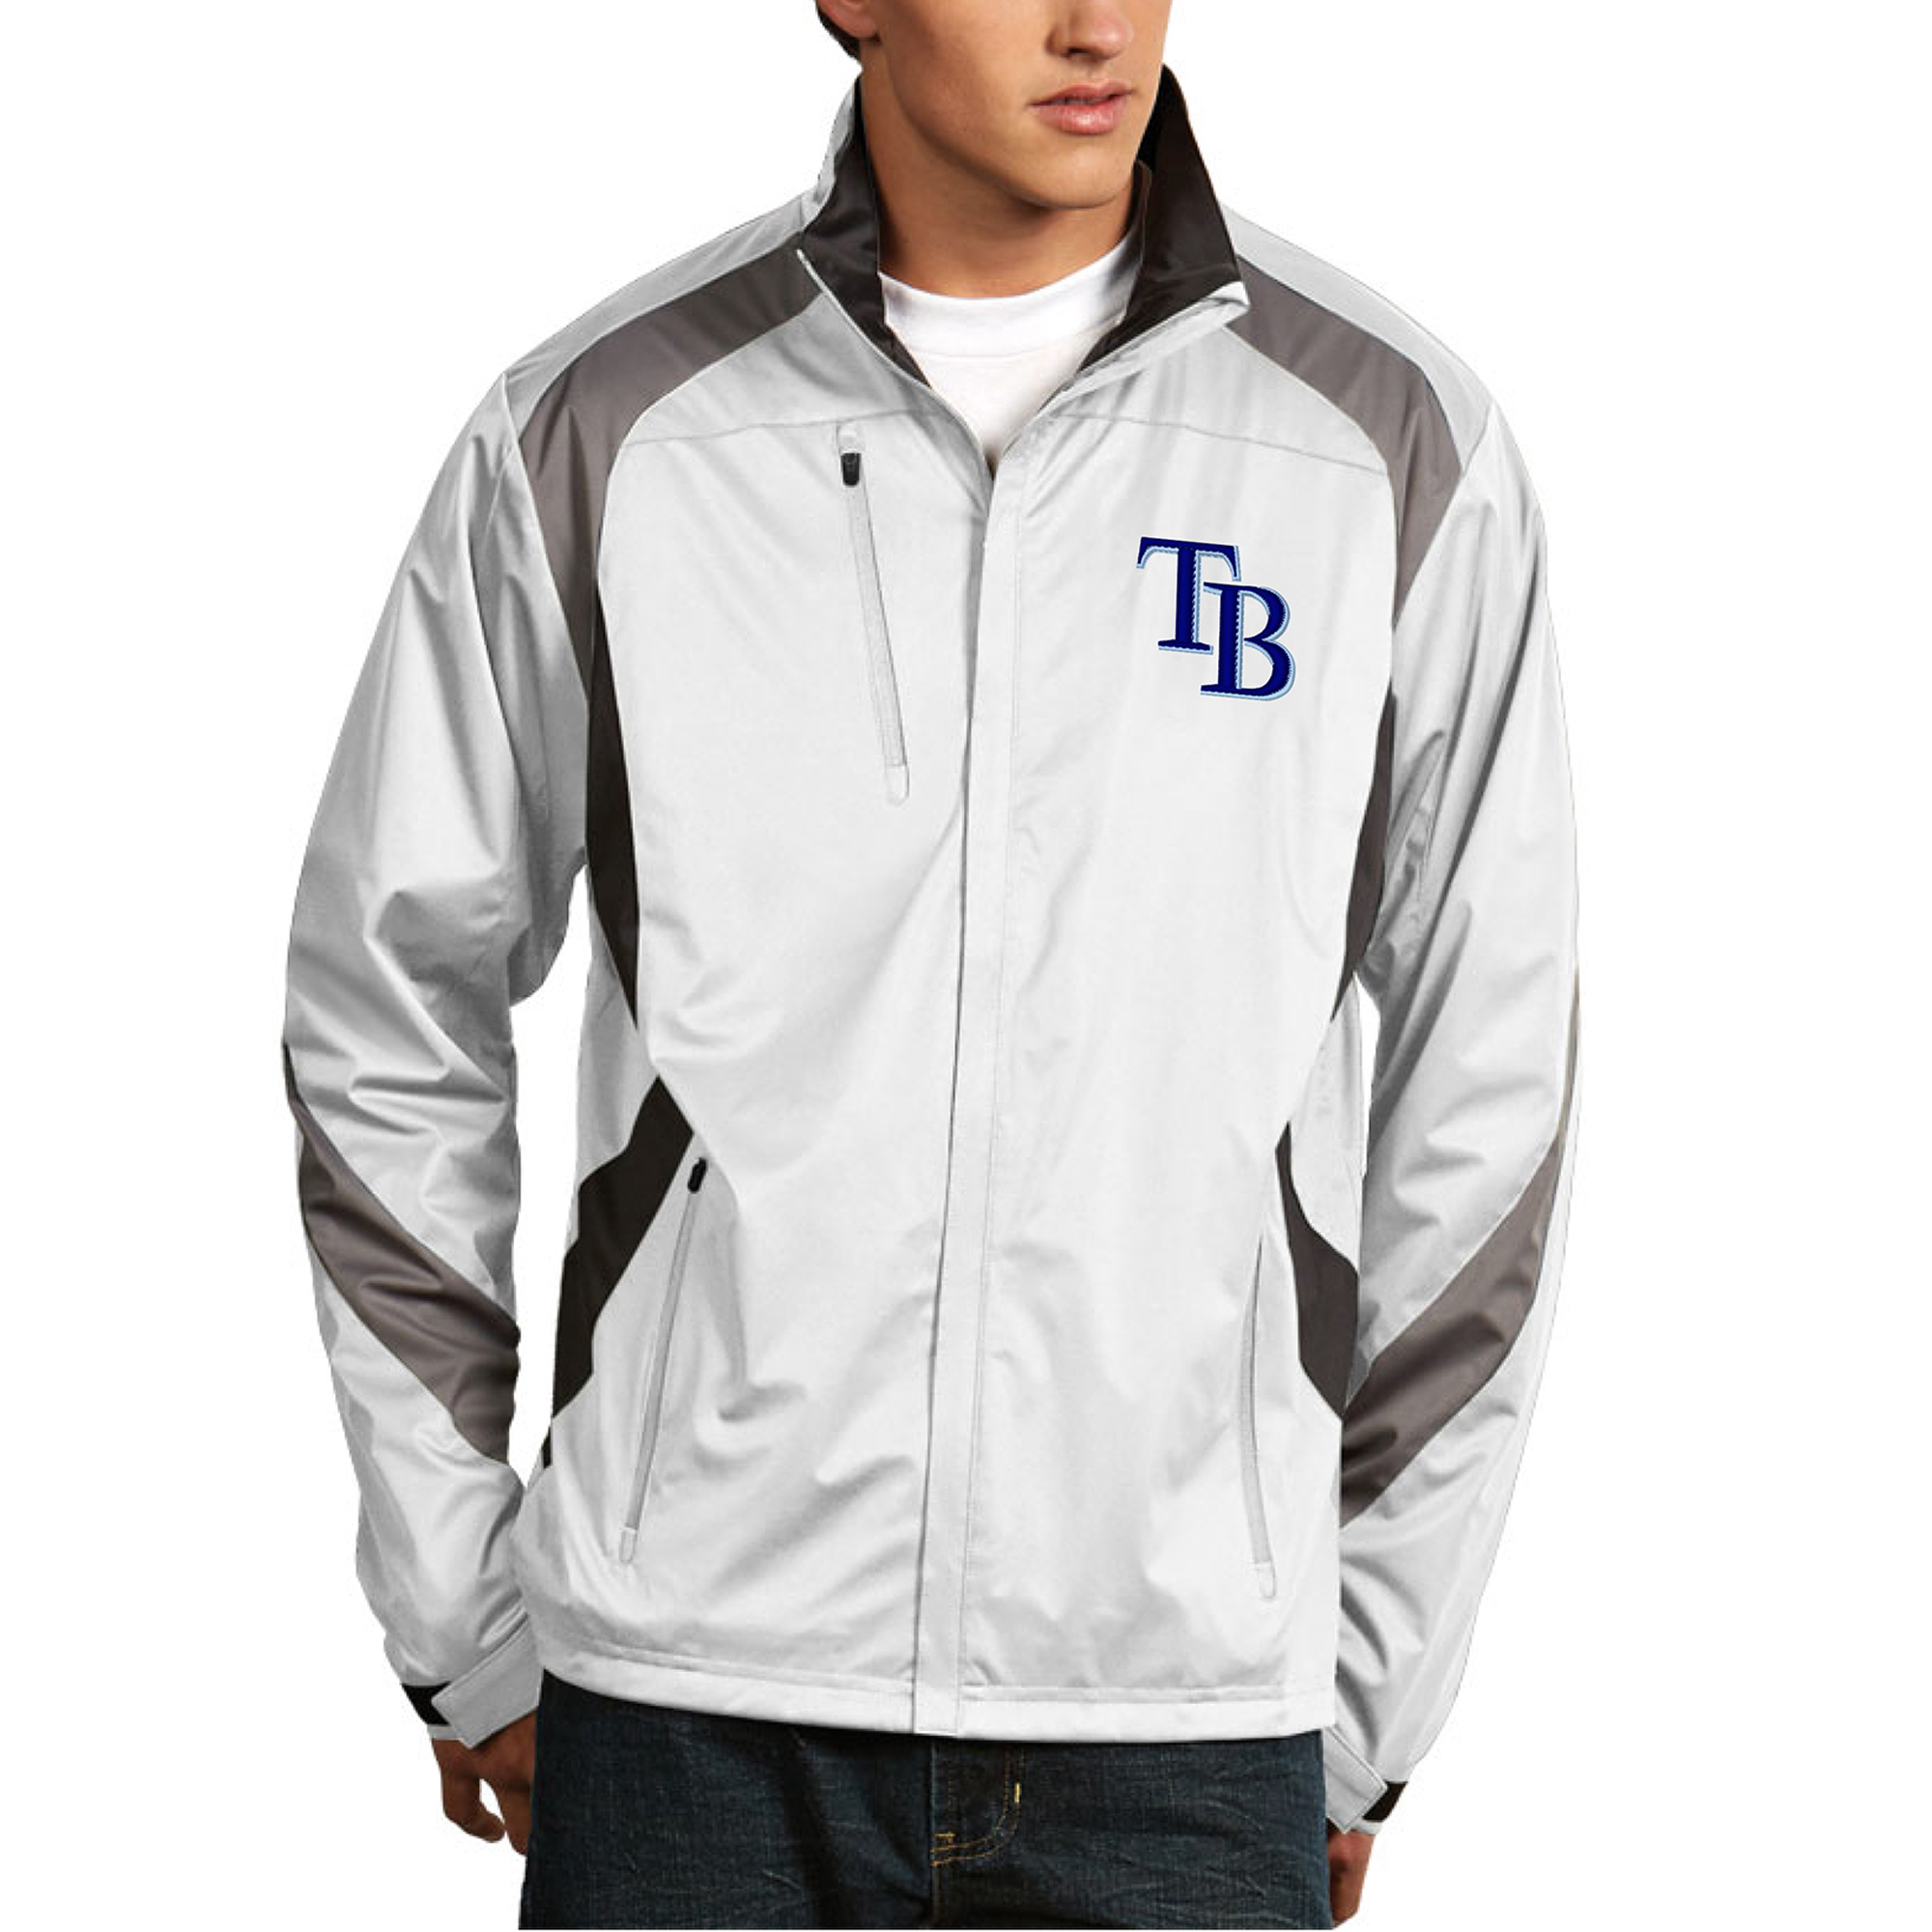 Men's Antigua White Tampa Bay Rays Tempest Full-Zip Jacket